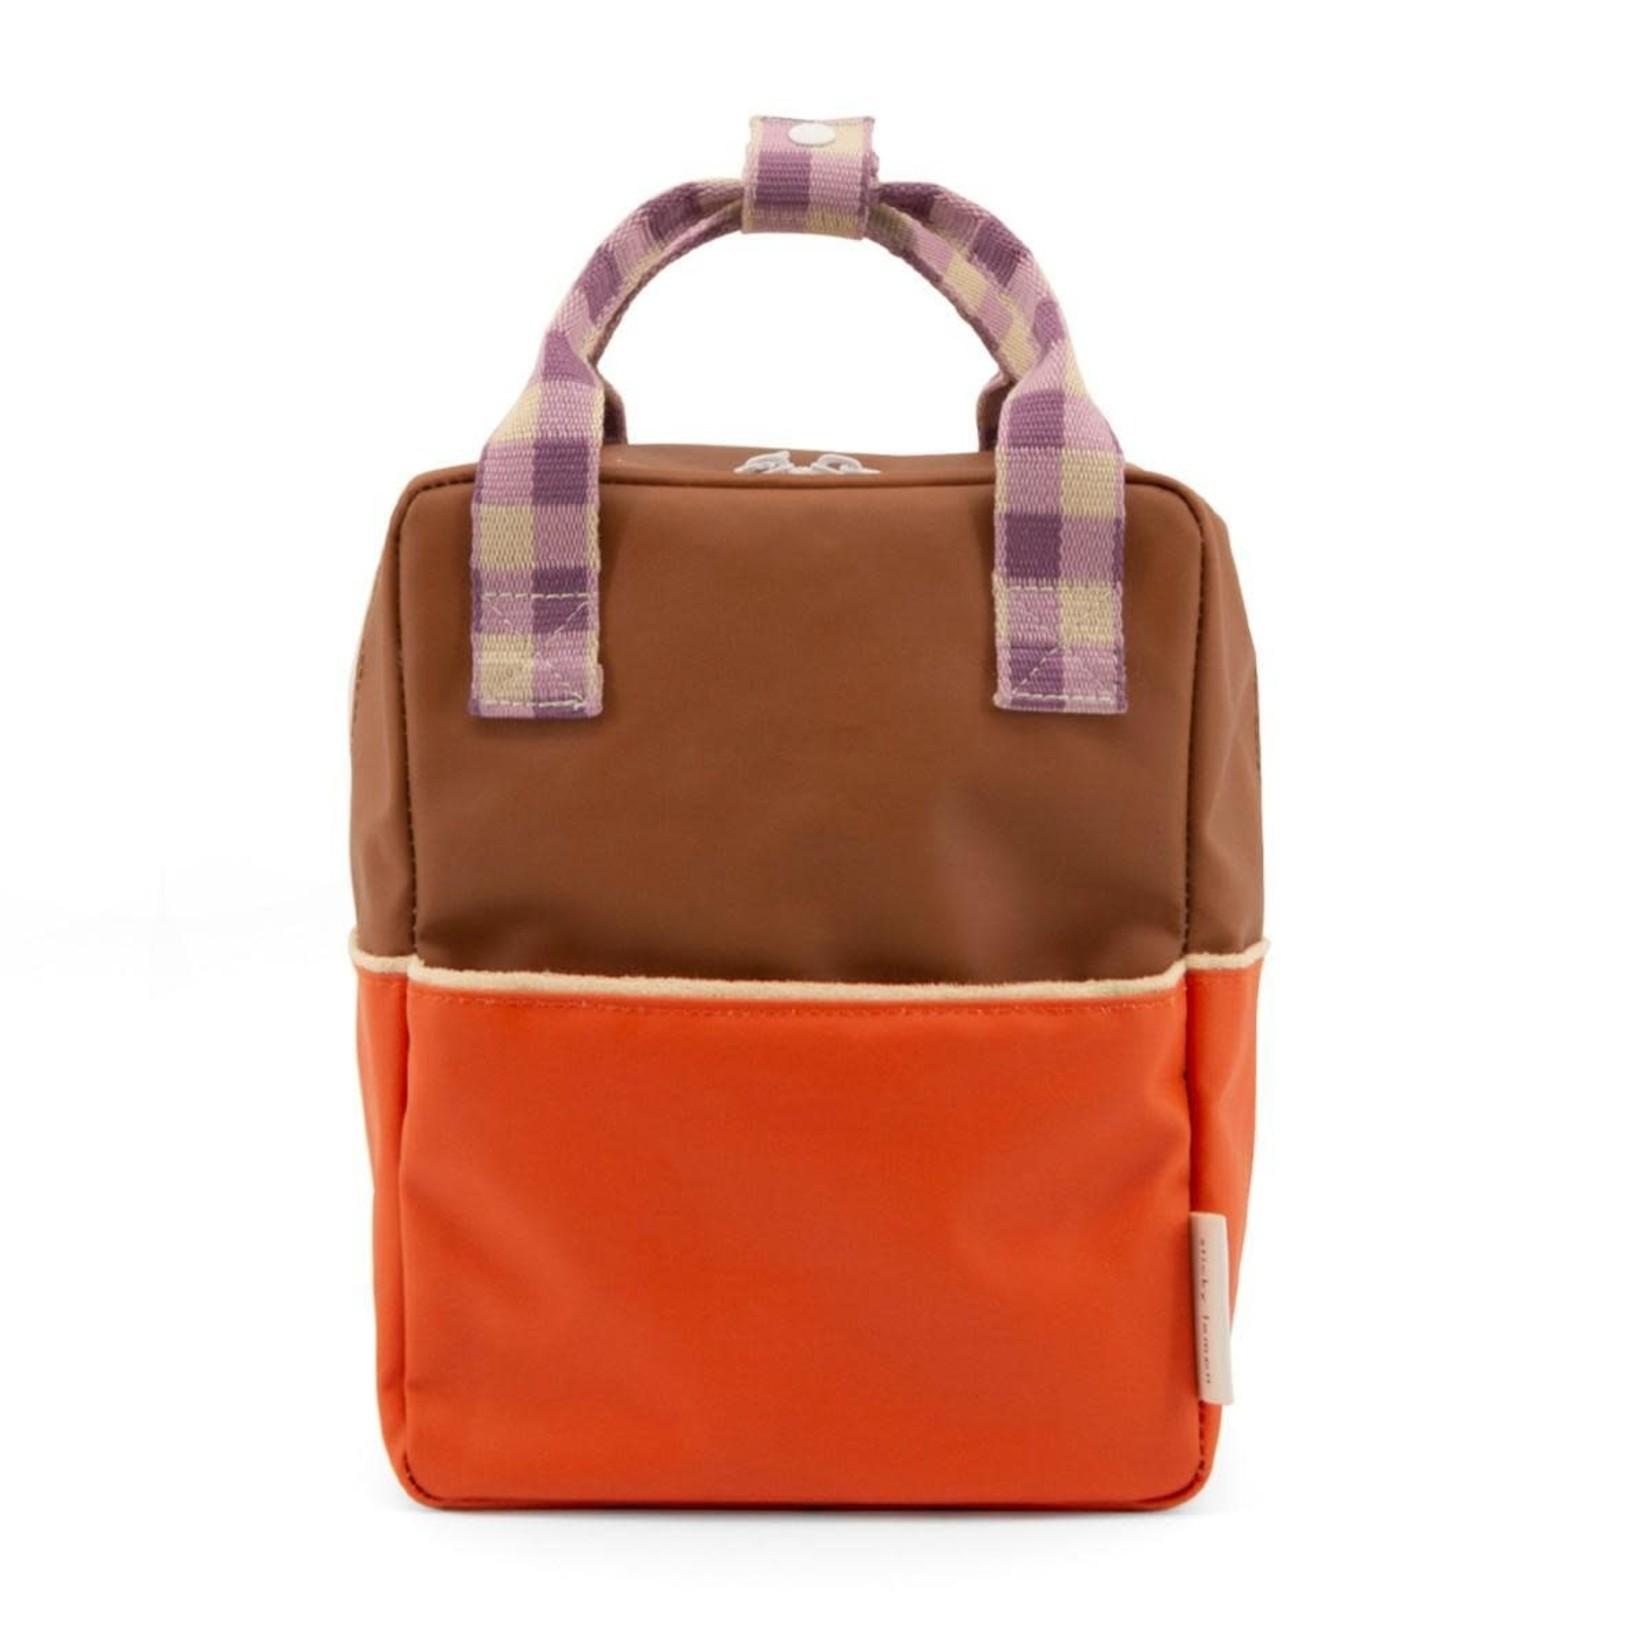 STICKY LEMON TICKY LEMON backpack small colourblocking